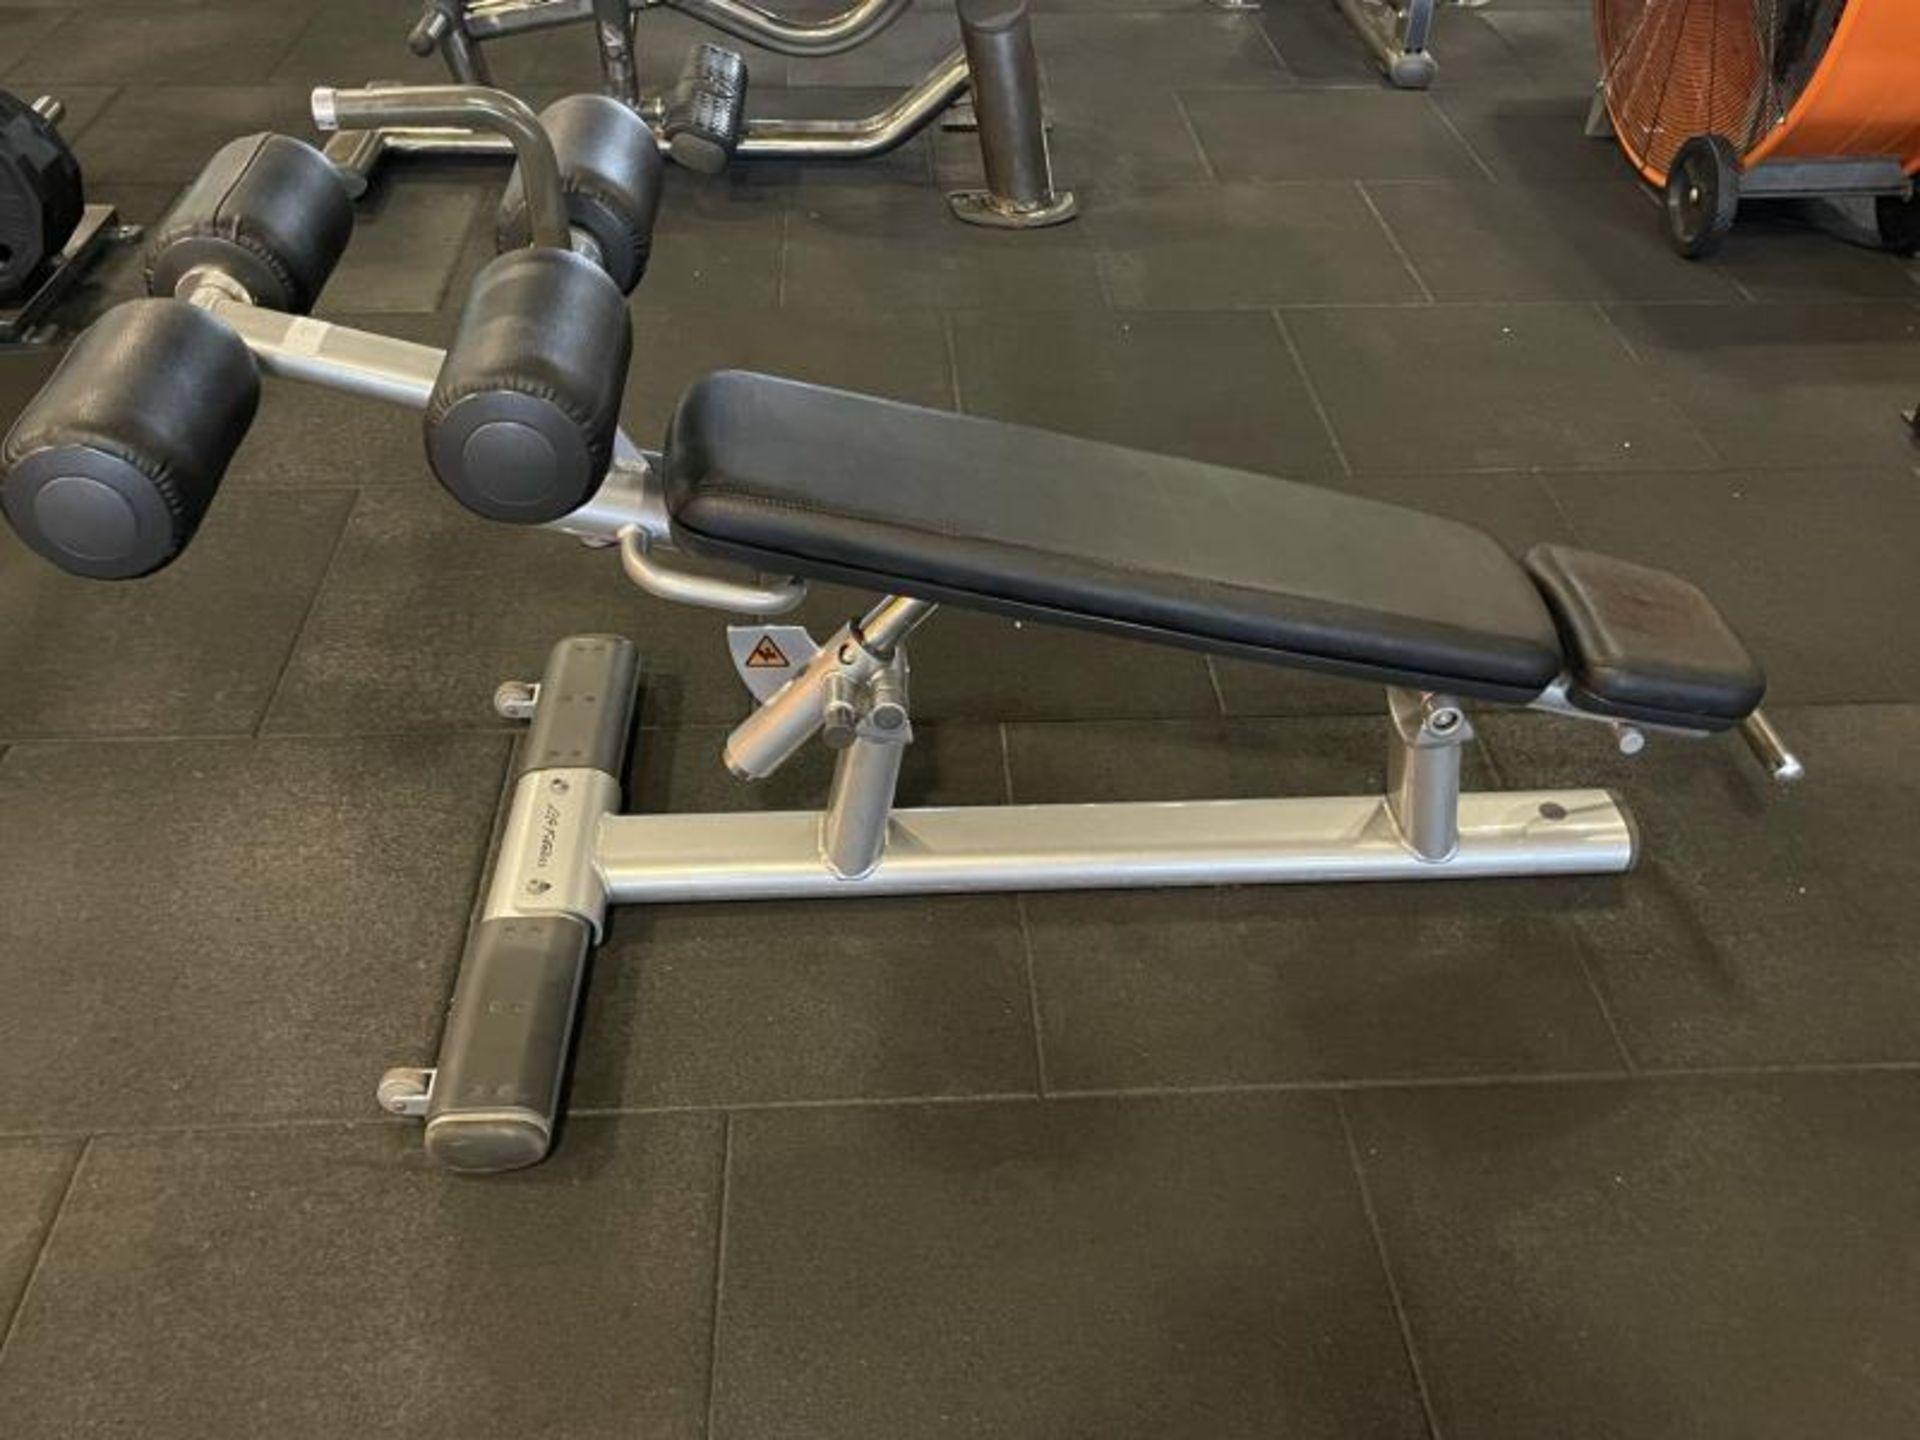 Hammer Strength Decline Bench M: SADB